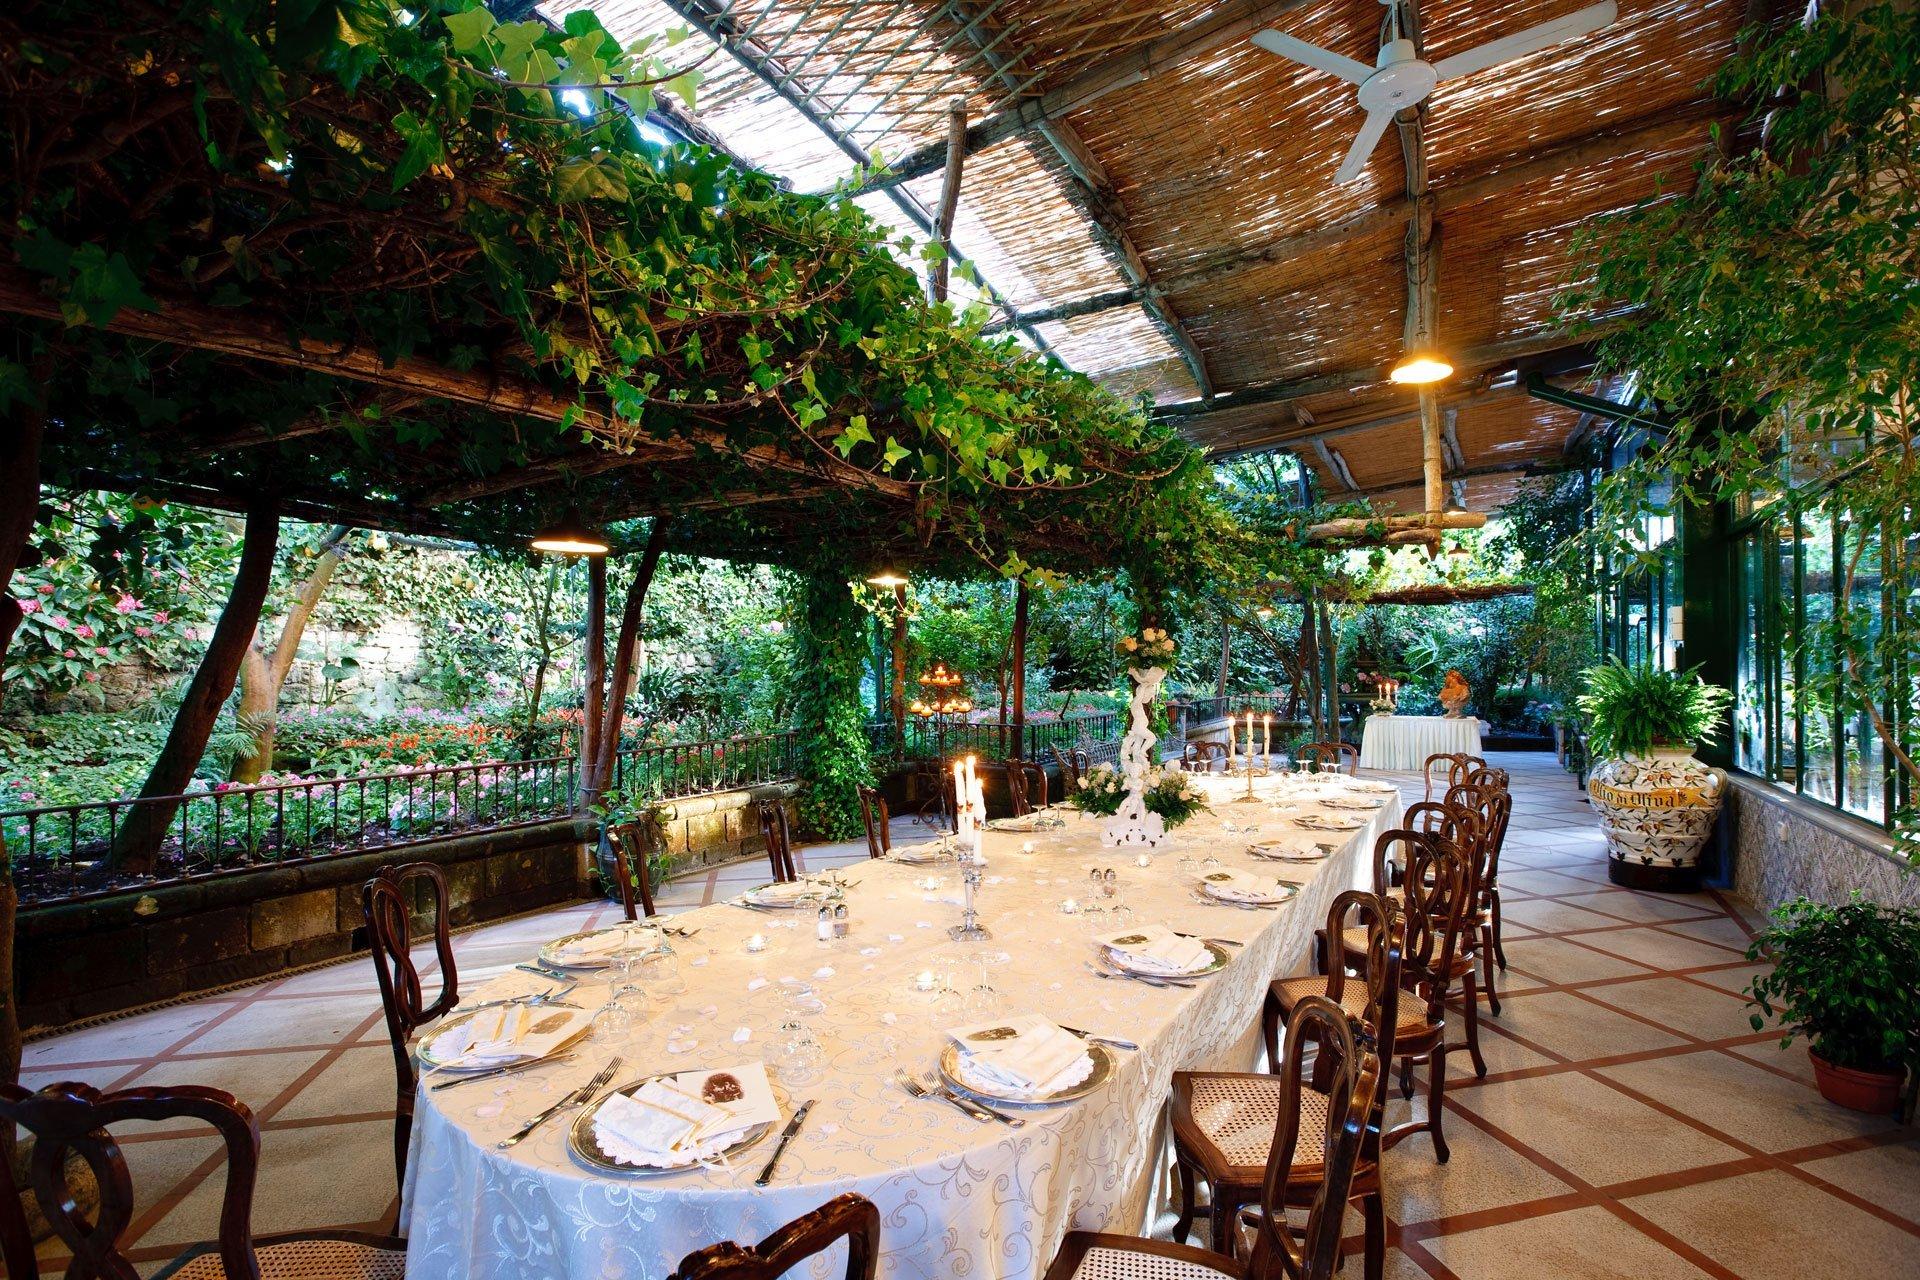 Best Restaurants Sorrento Food Guide 2021 Sorrentovibes